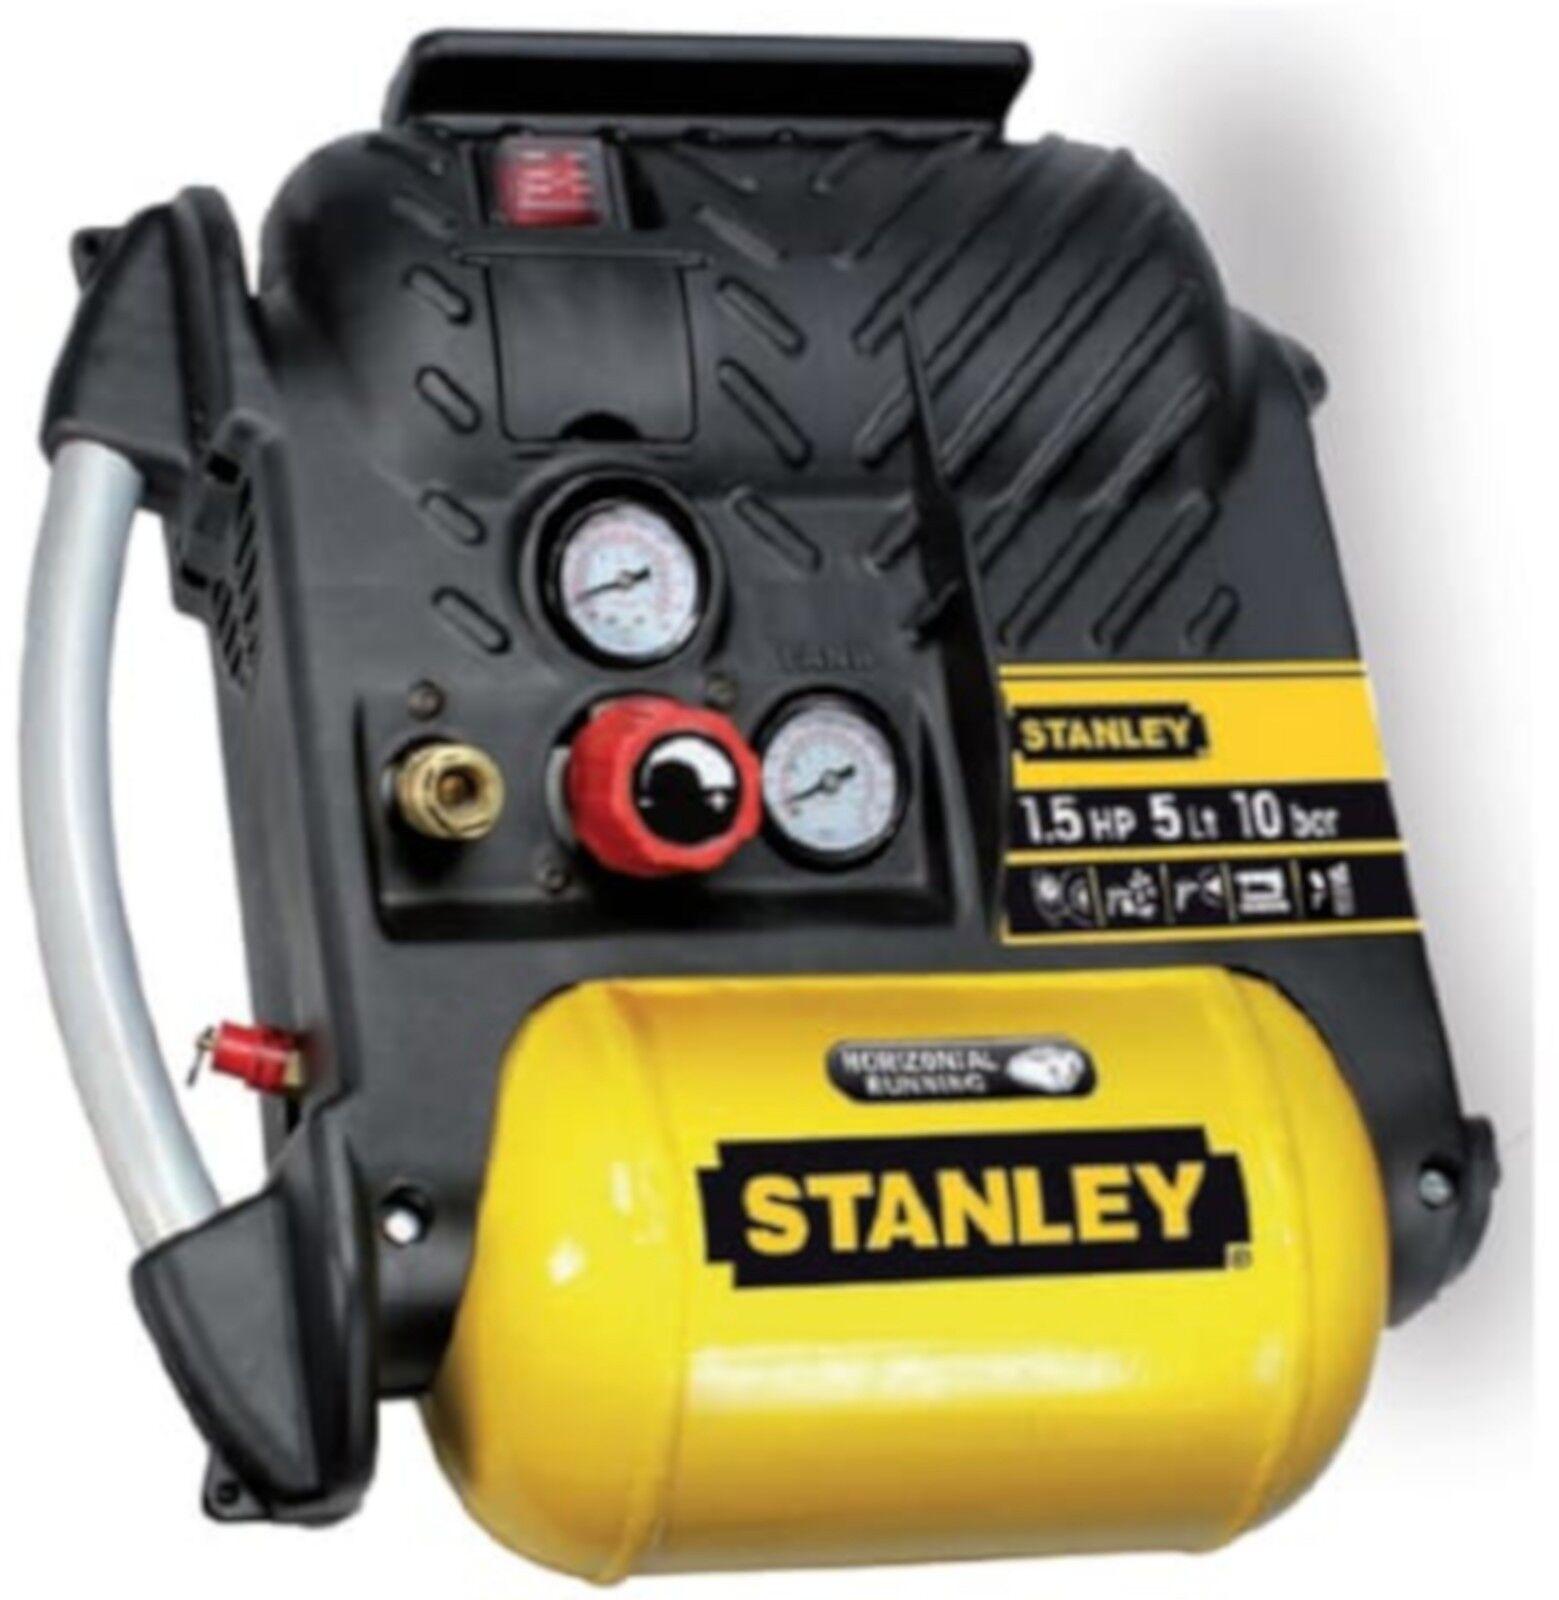 Compressore aria Stanley Airboss DN200/10/5 5 lt 1,5 HP HP HP b80248